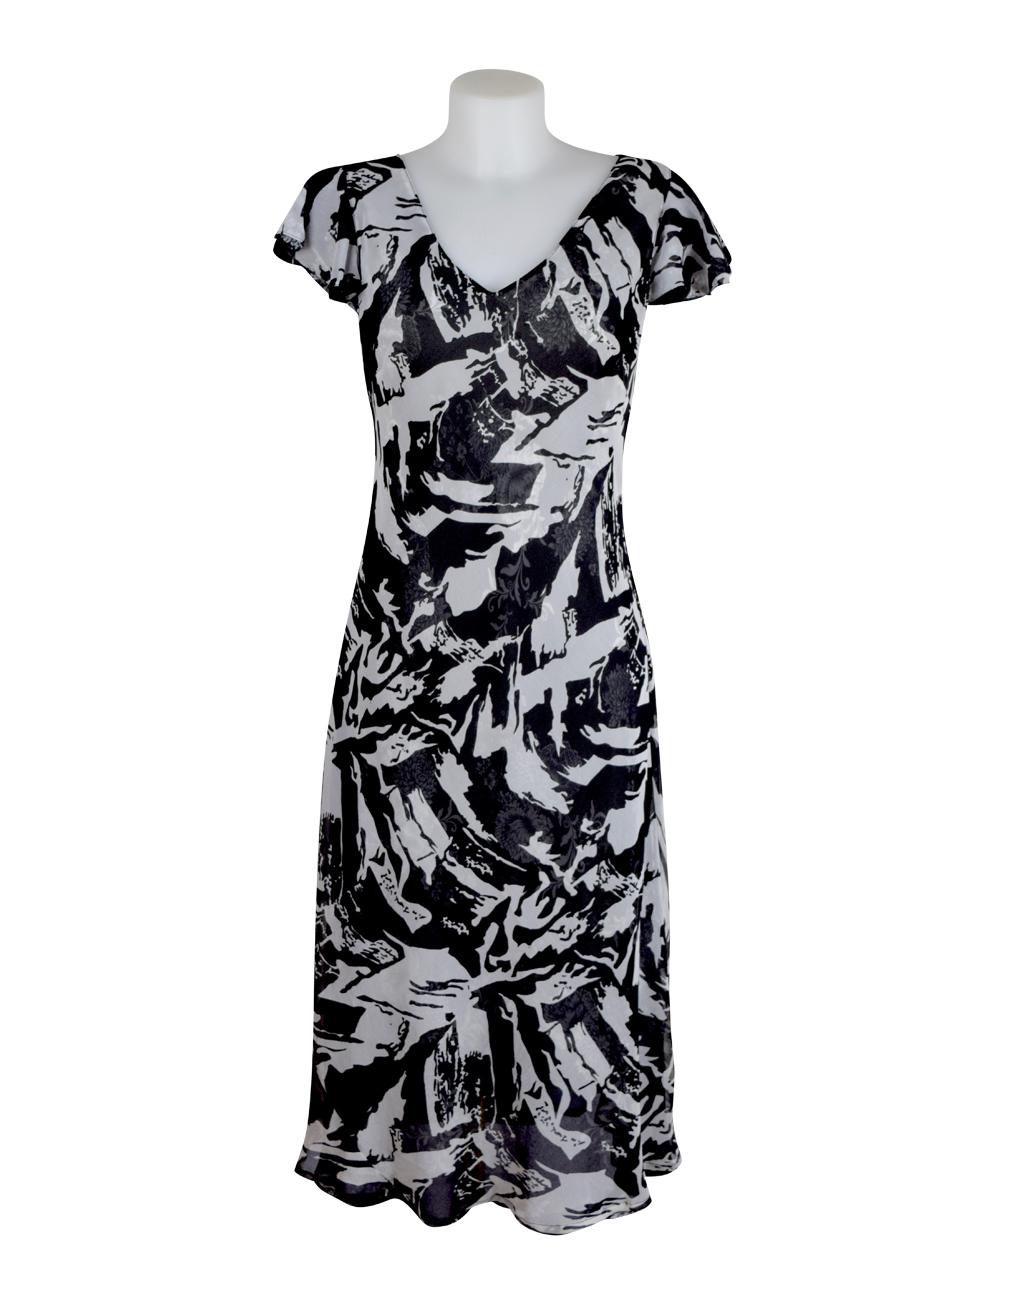 Paramour Reversible Dress Cap Sleeve Black & White